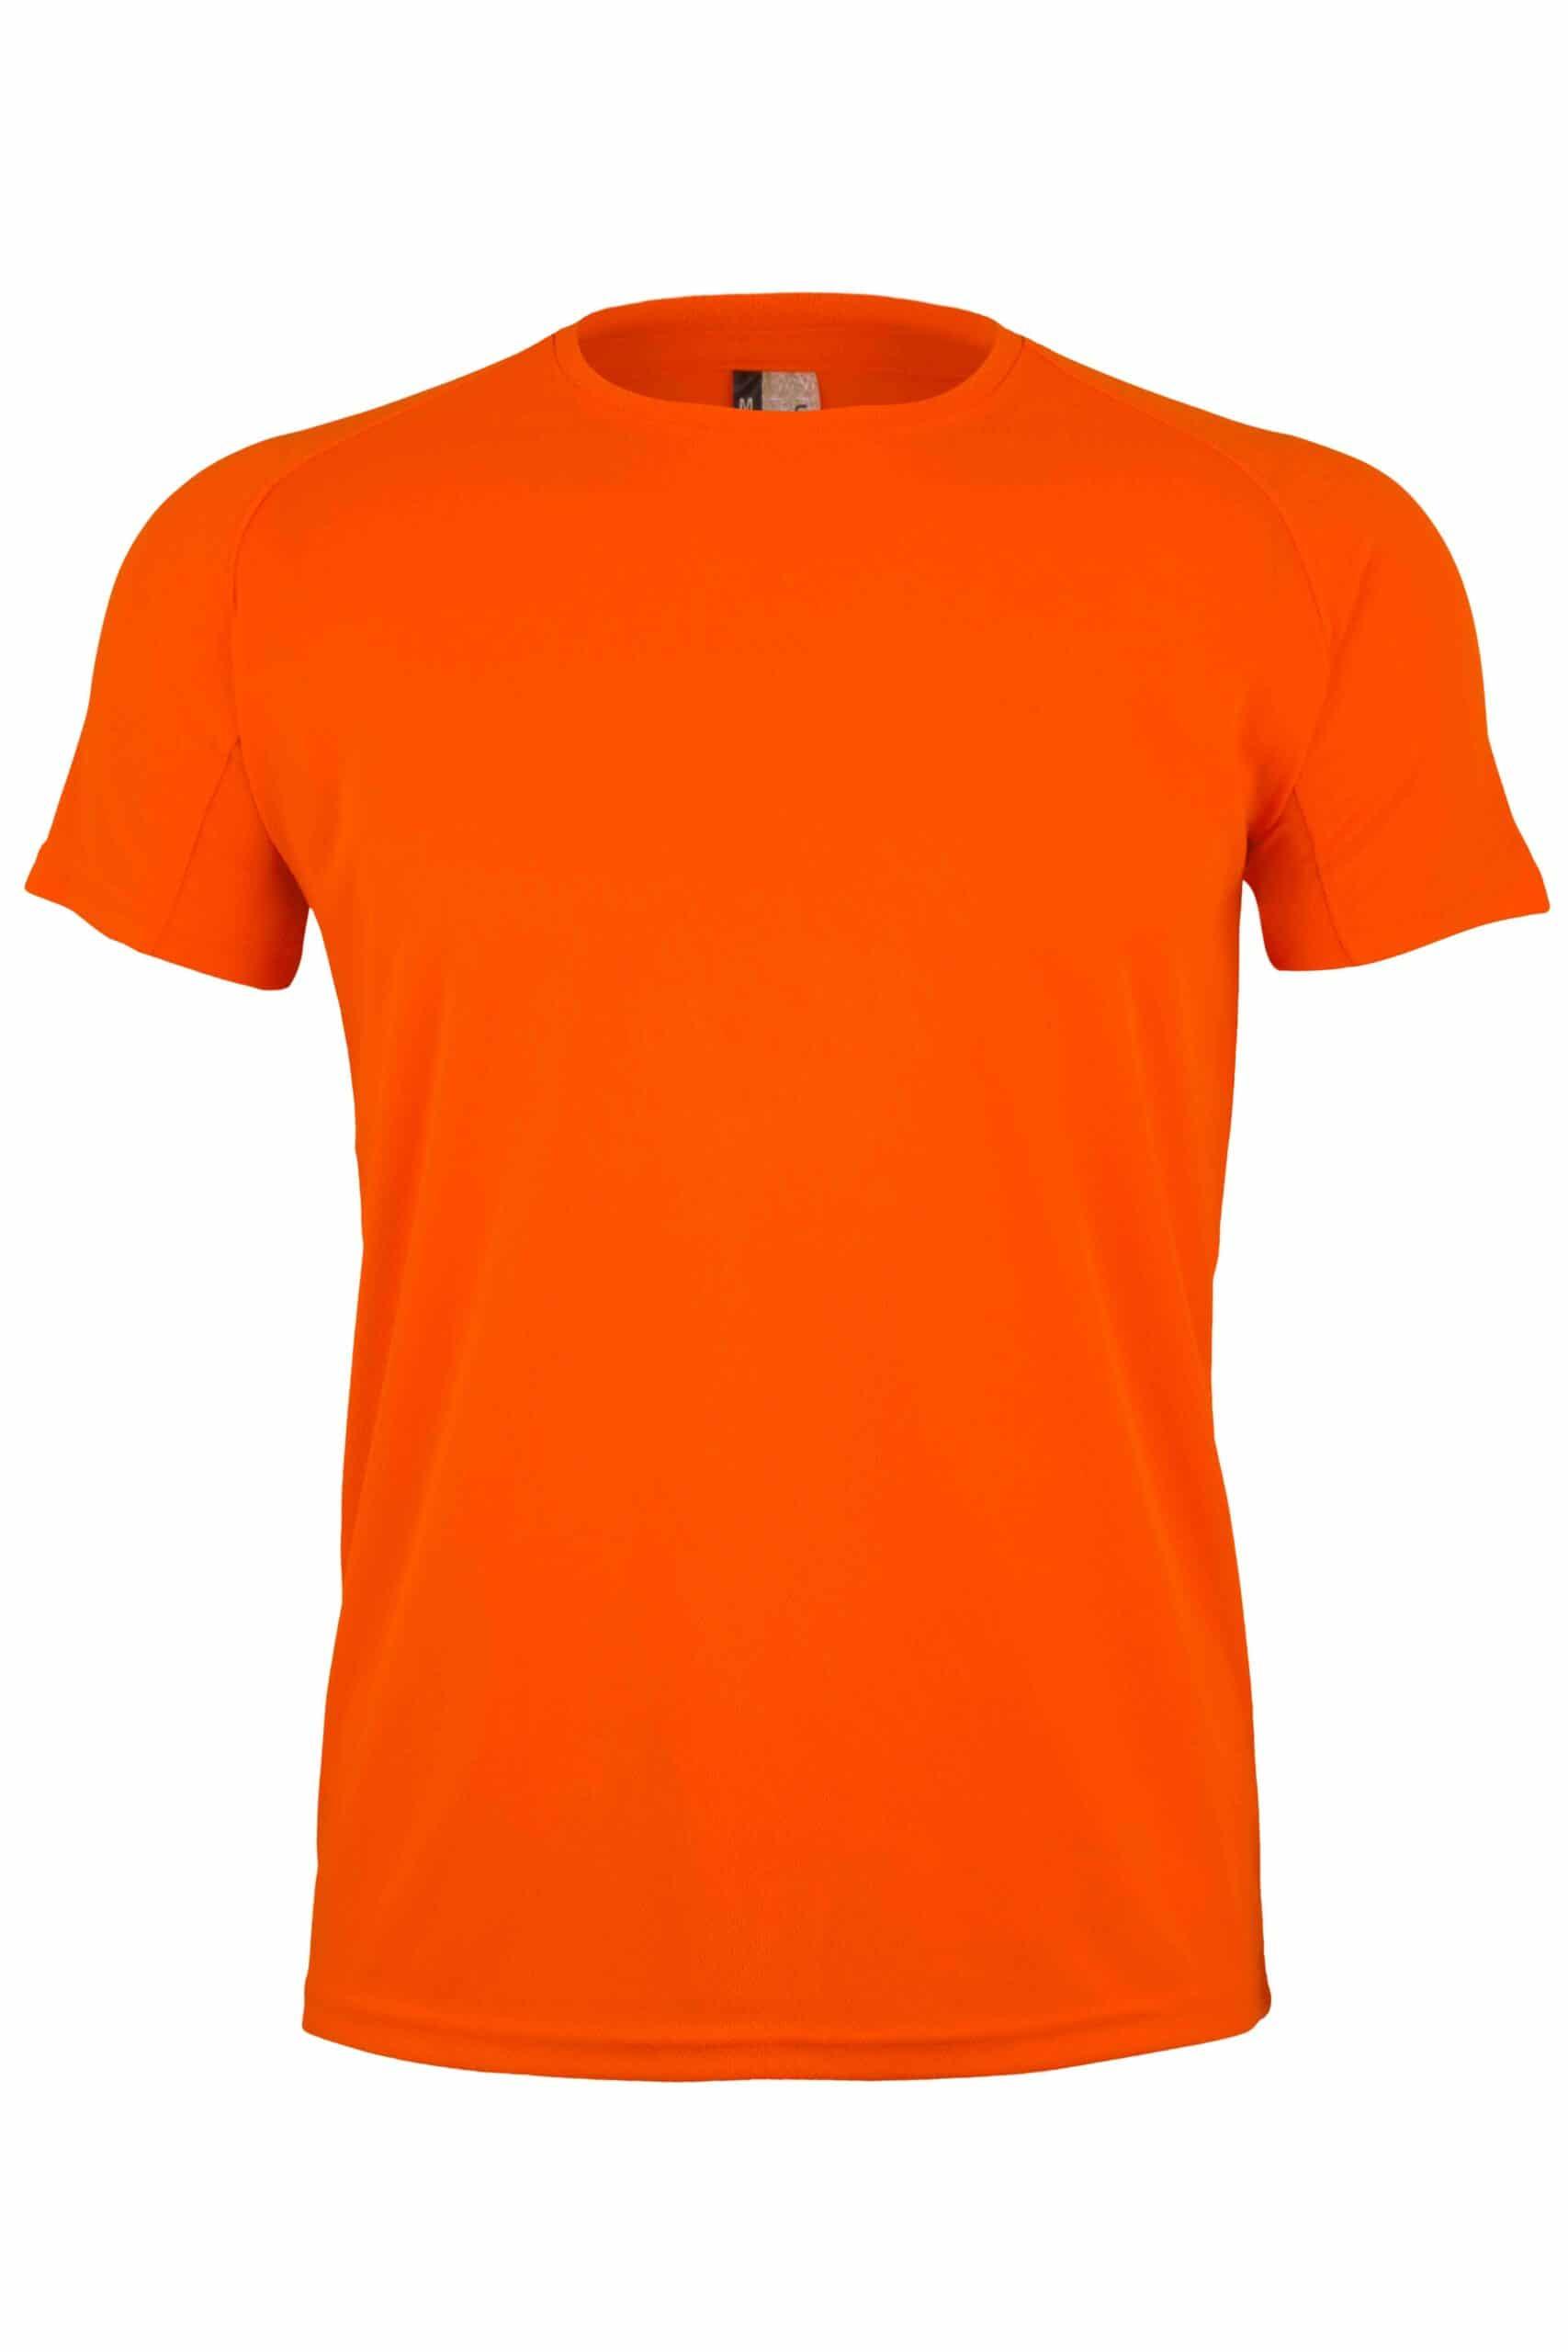 Mukua Mk520v Camiseta TÉcnica Manga Corta FlÚor Orange